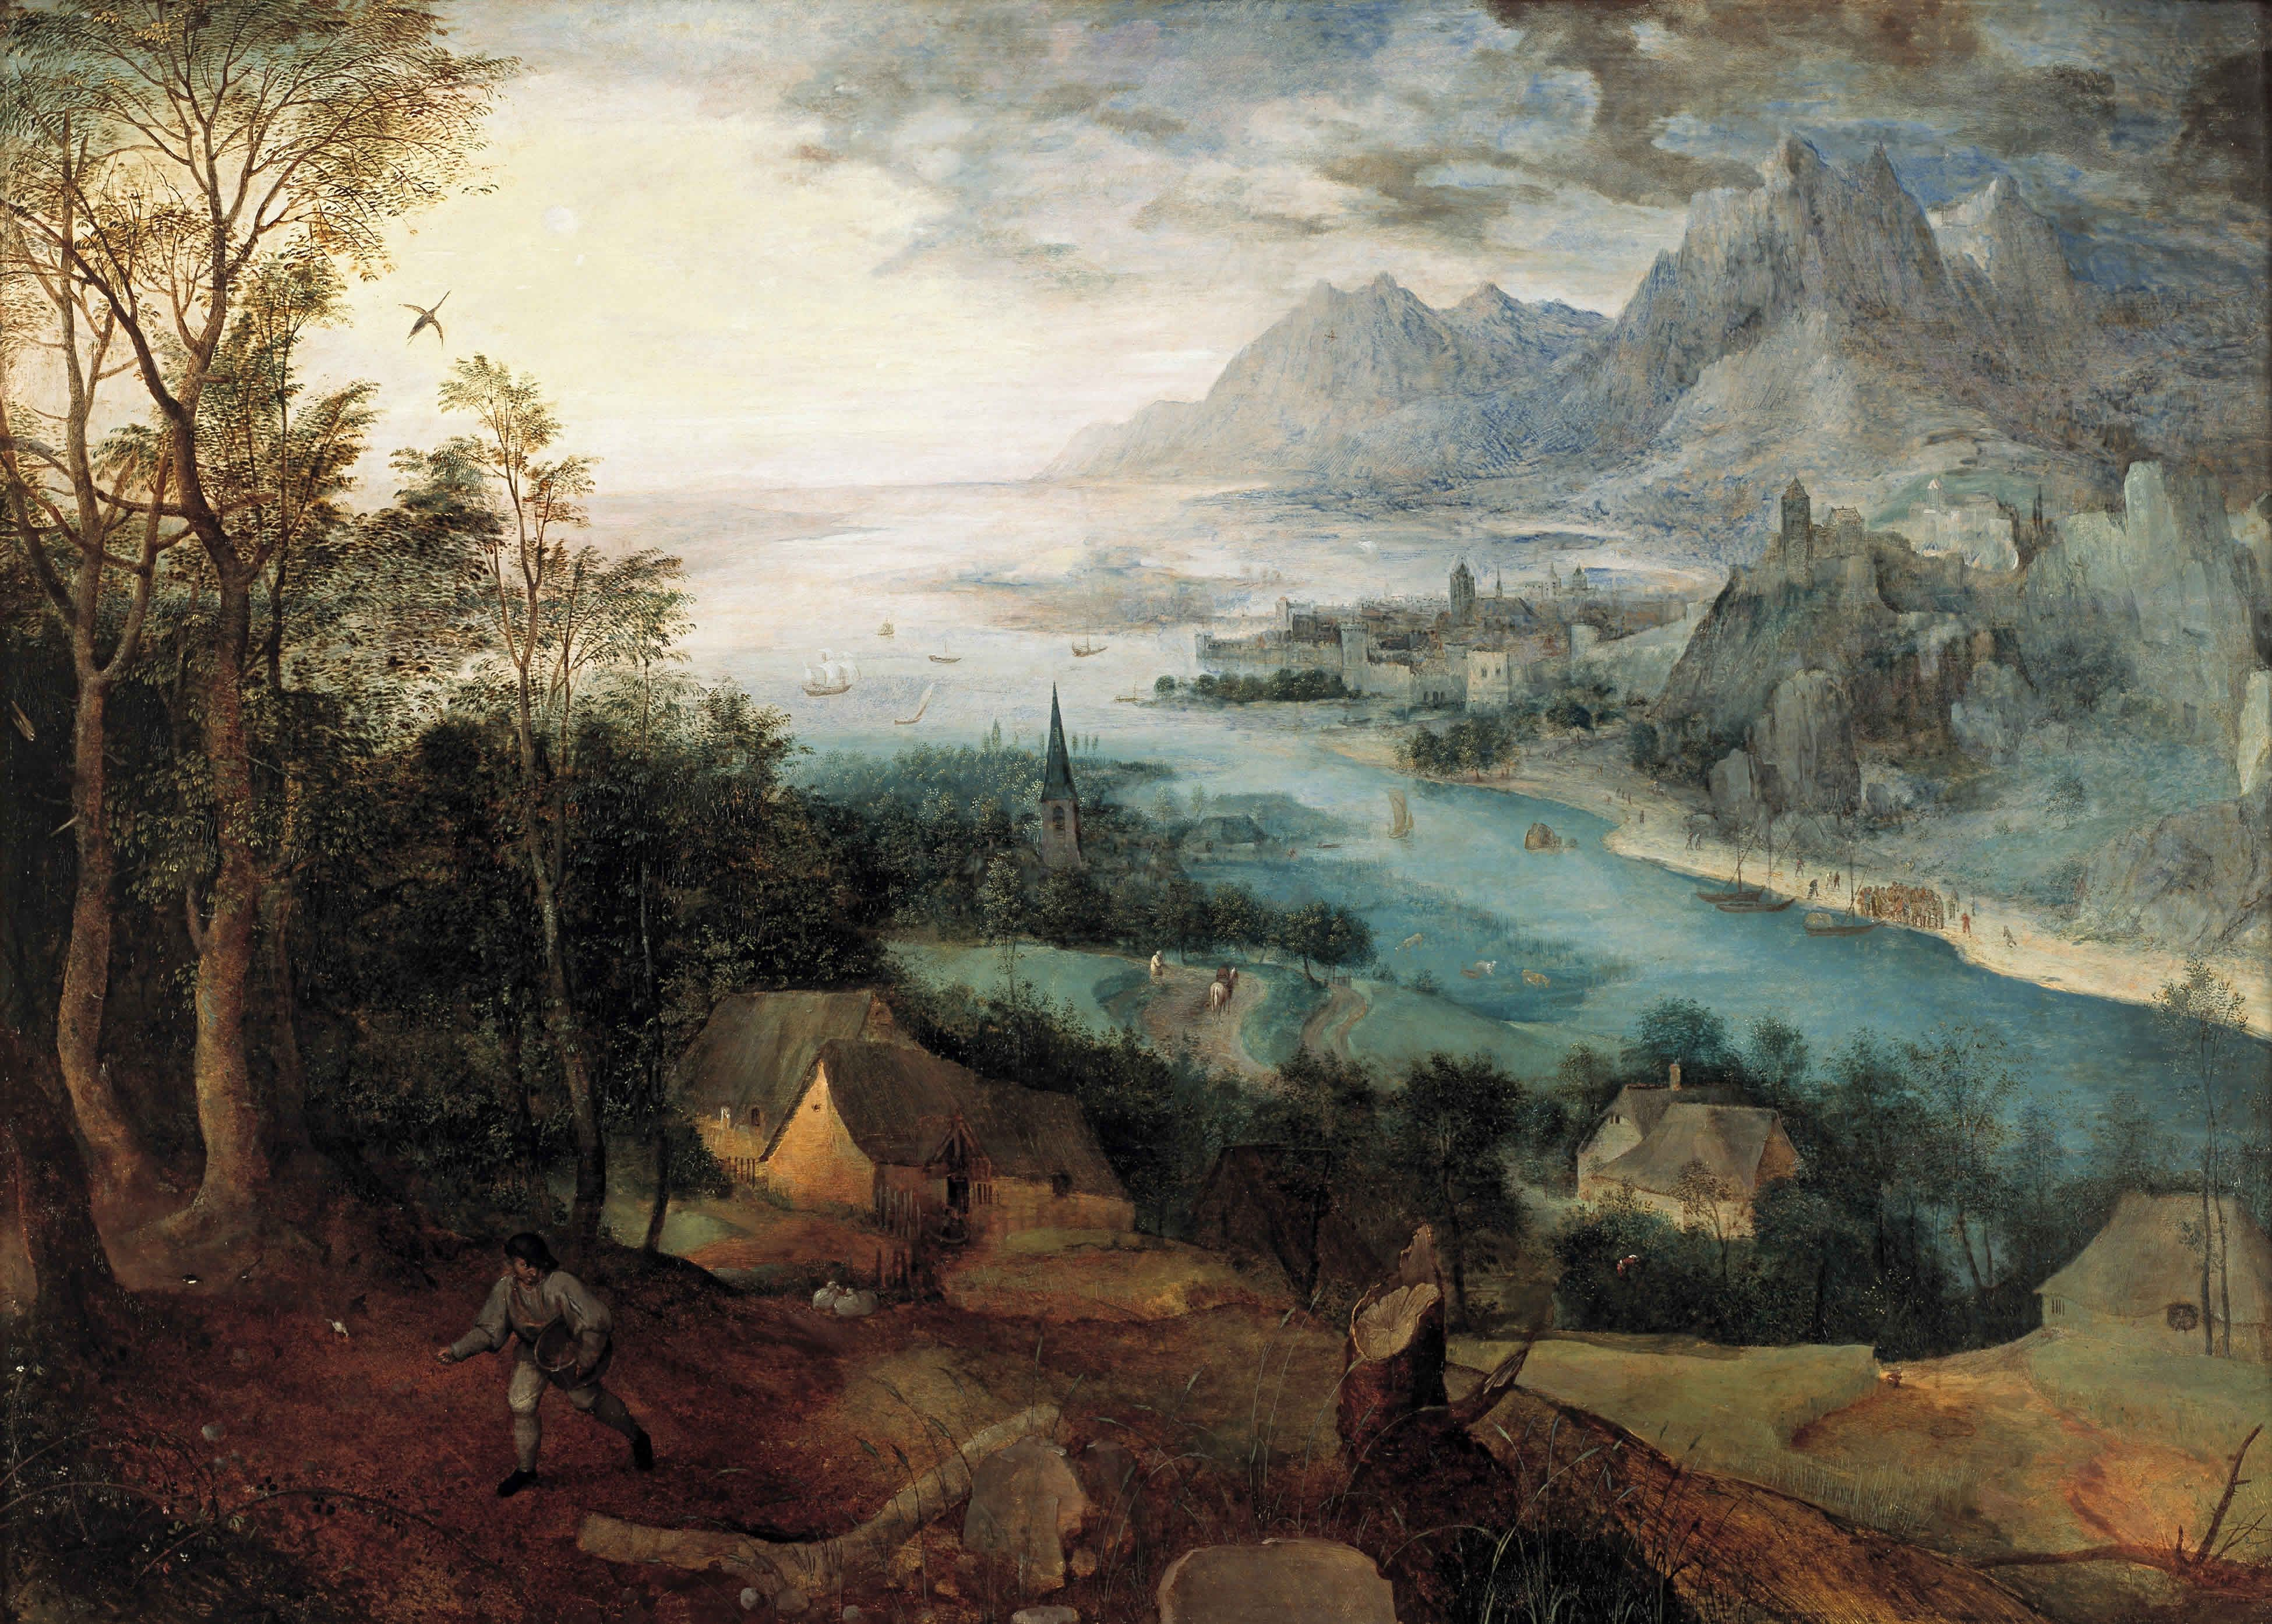 Landschaftsmalerei renaissance  Bruegel the Elder - Parable of the Sower 1557.   Grand 18th-19th C ...